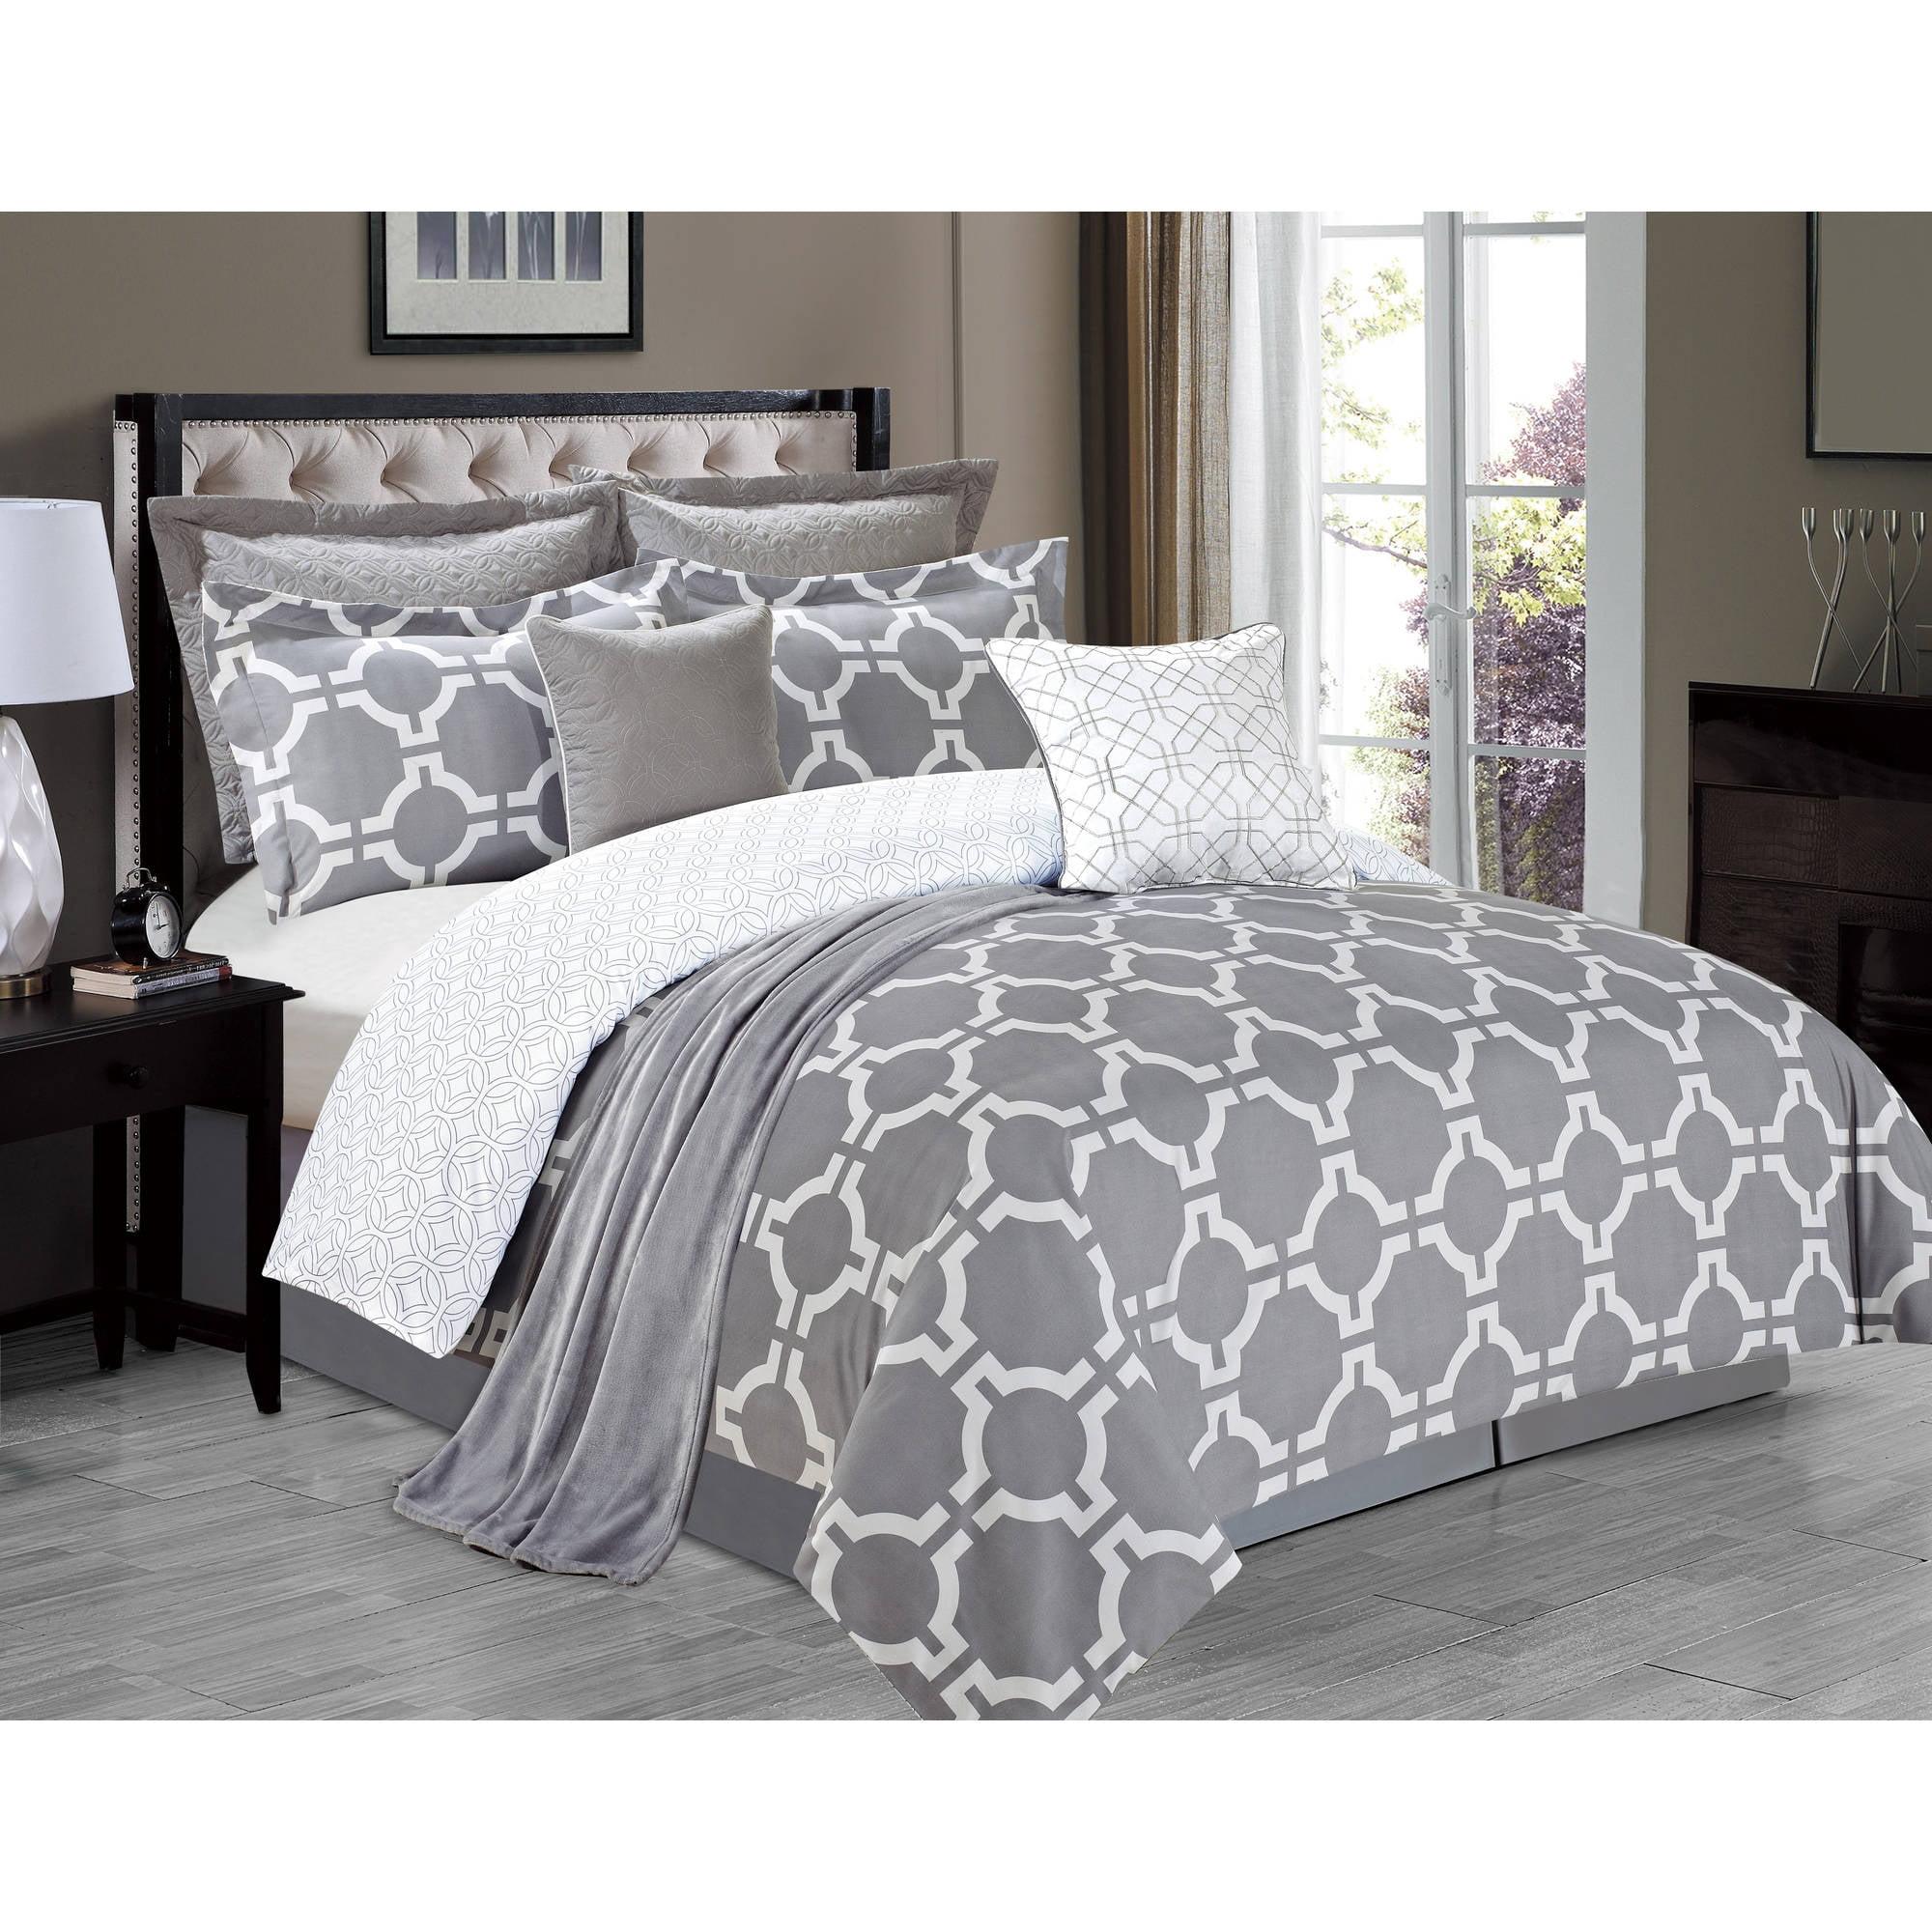 Belmore 8-Piece Comforter Set